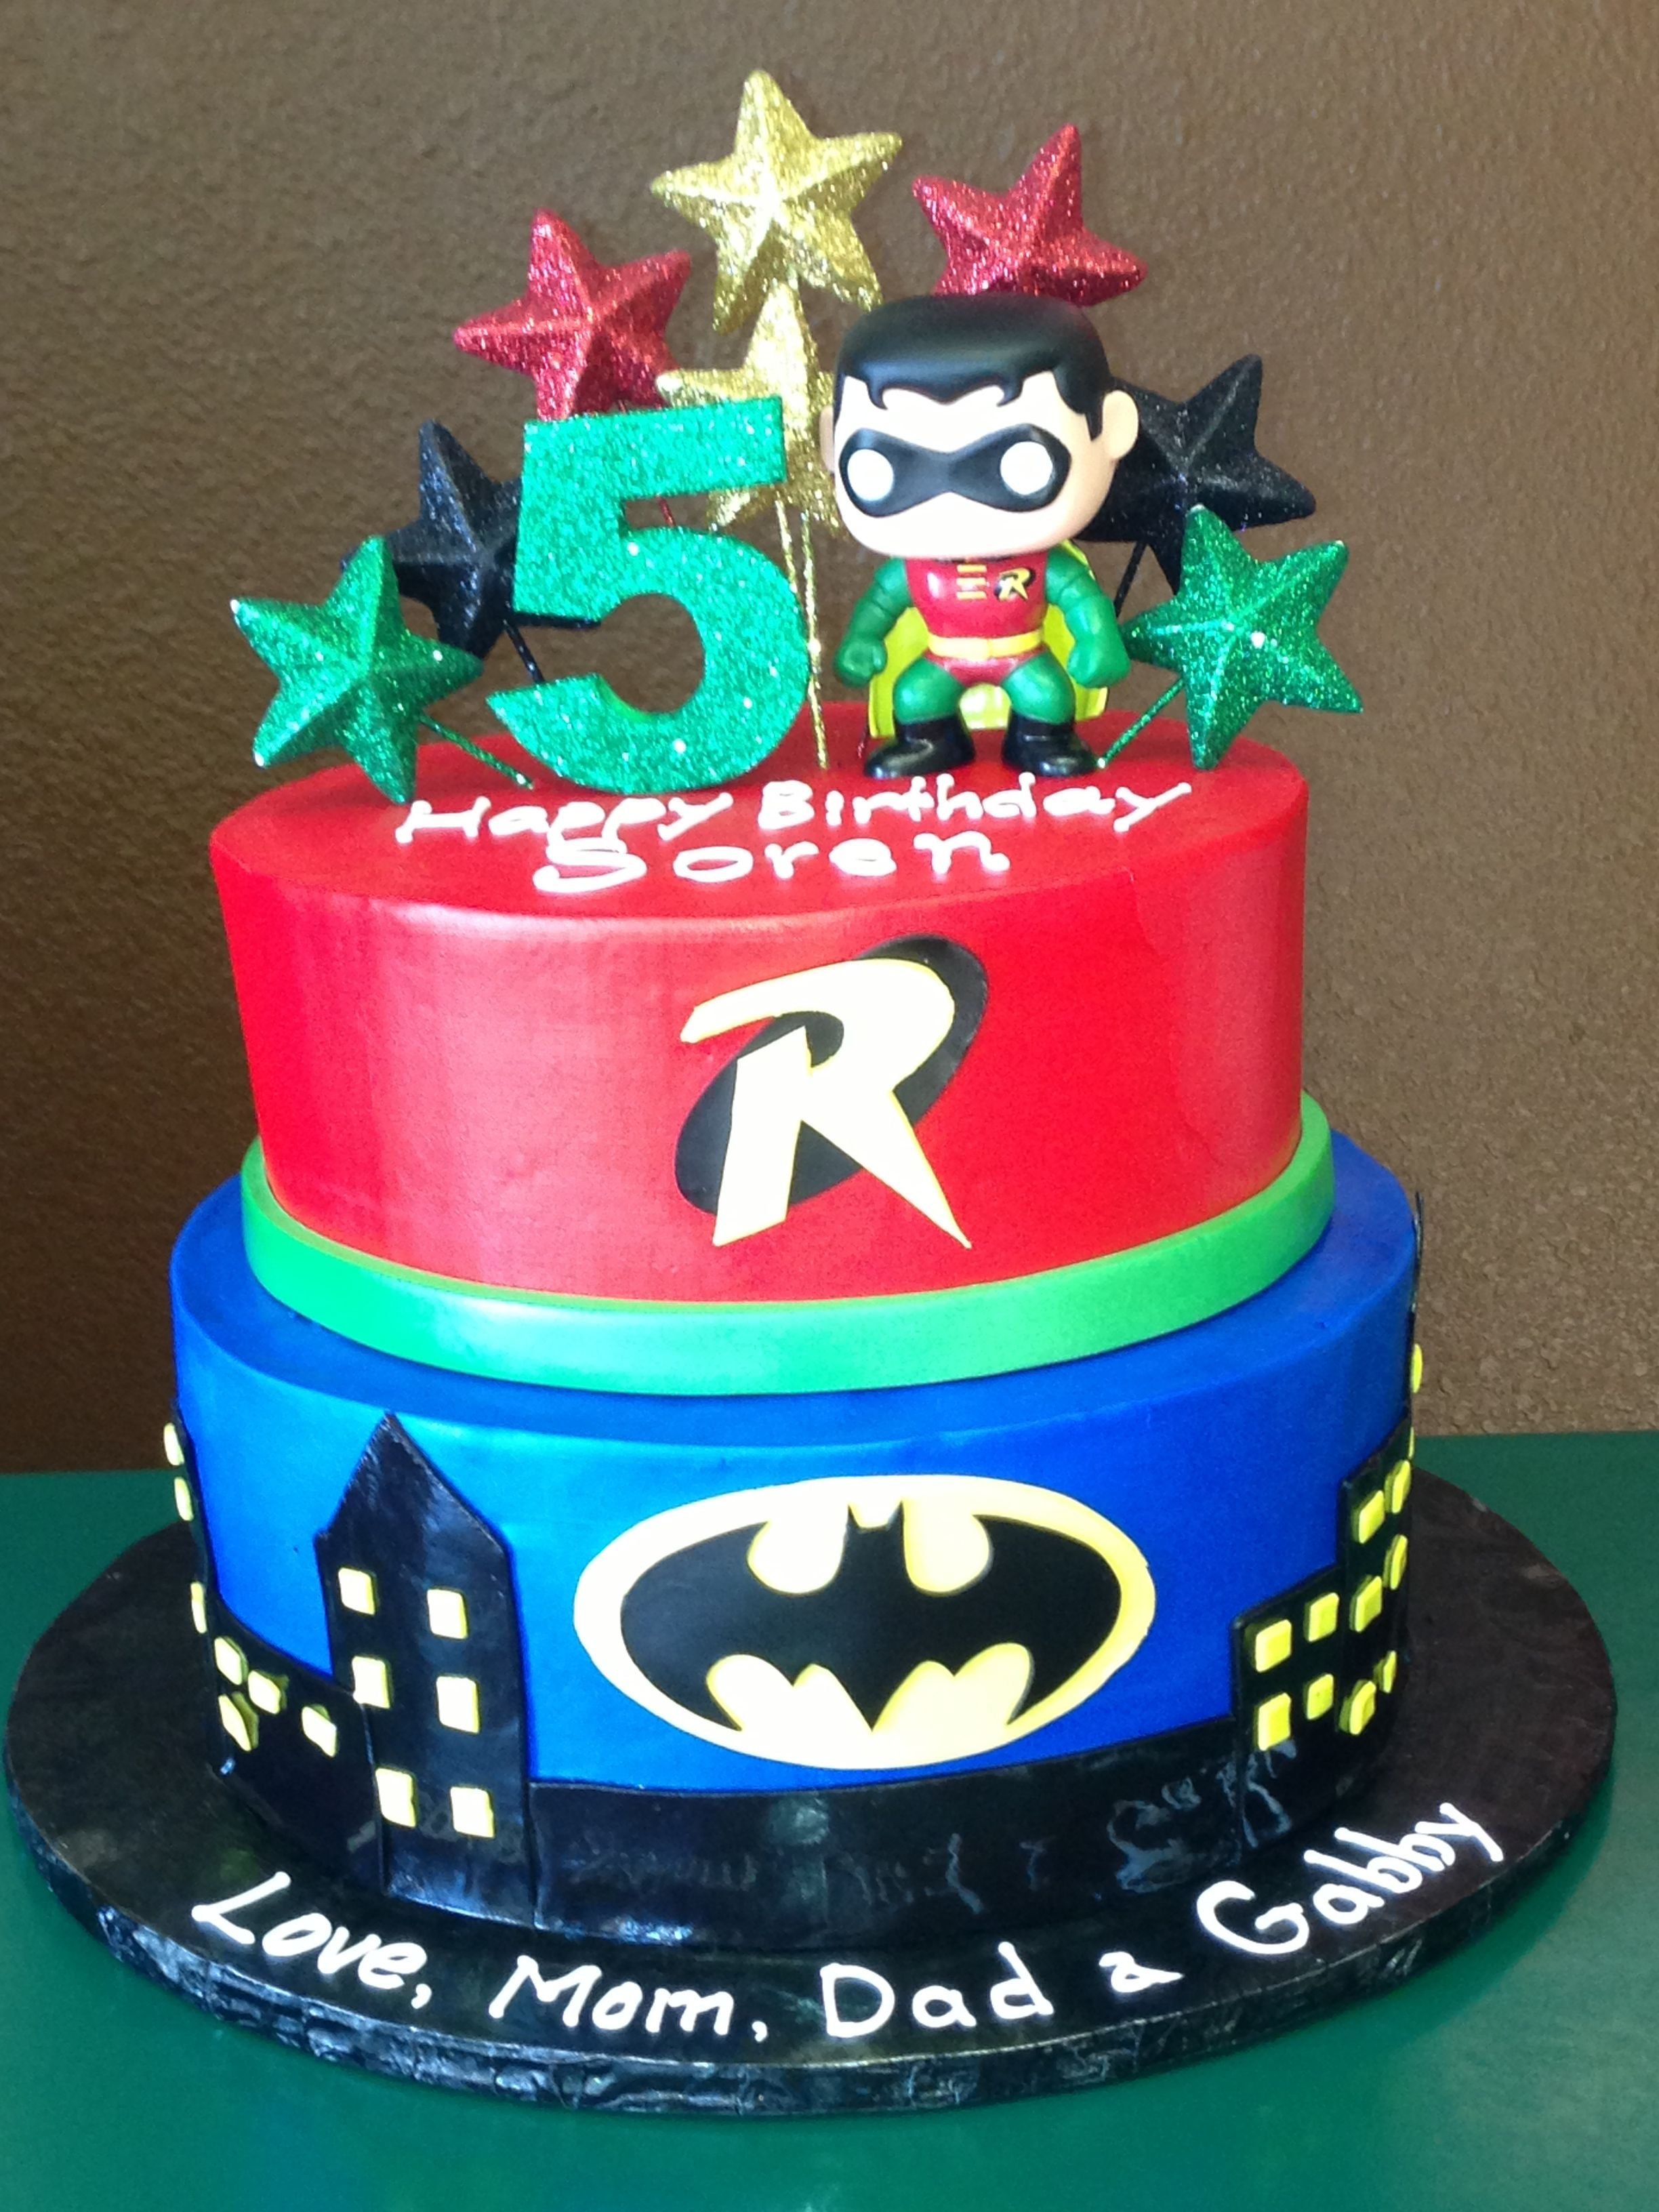 Childrens birthday cake by cake designs las vegas